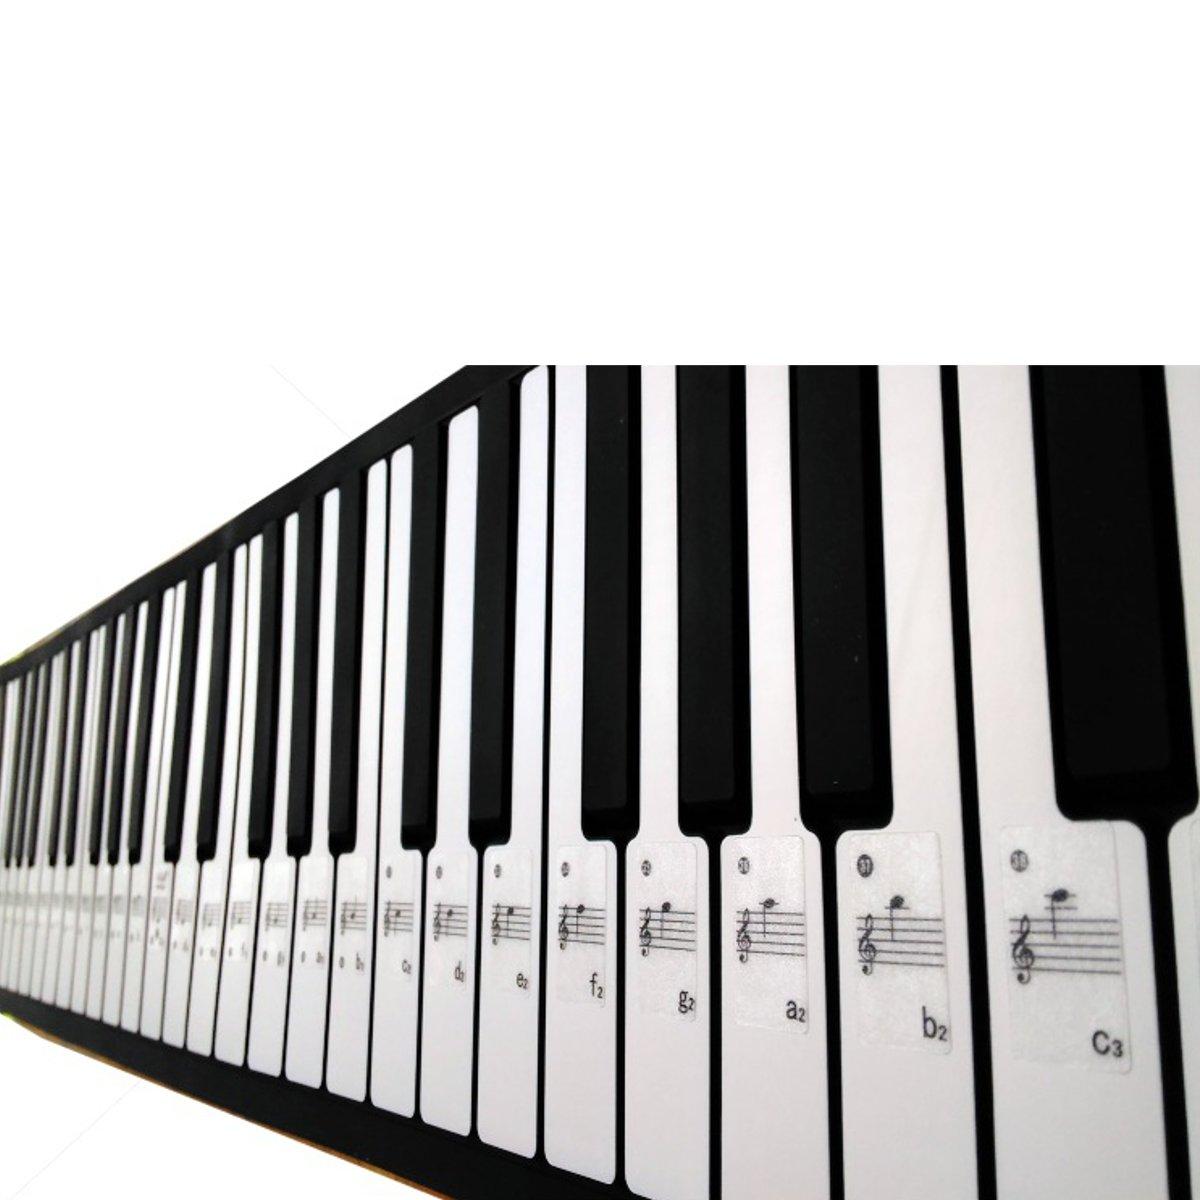 Profesi Piano Stiker Transparan Piano Keyboard Sticker 61 88 Kunci Keyboard Elektronik Piano Mencegah Catatan Stiker Untuk Putih Kunci Piano Aliexpress